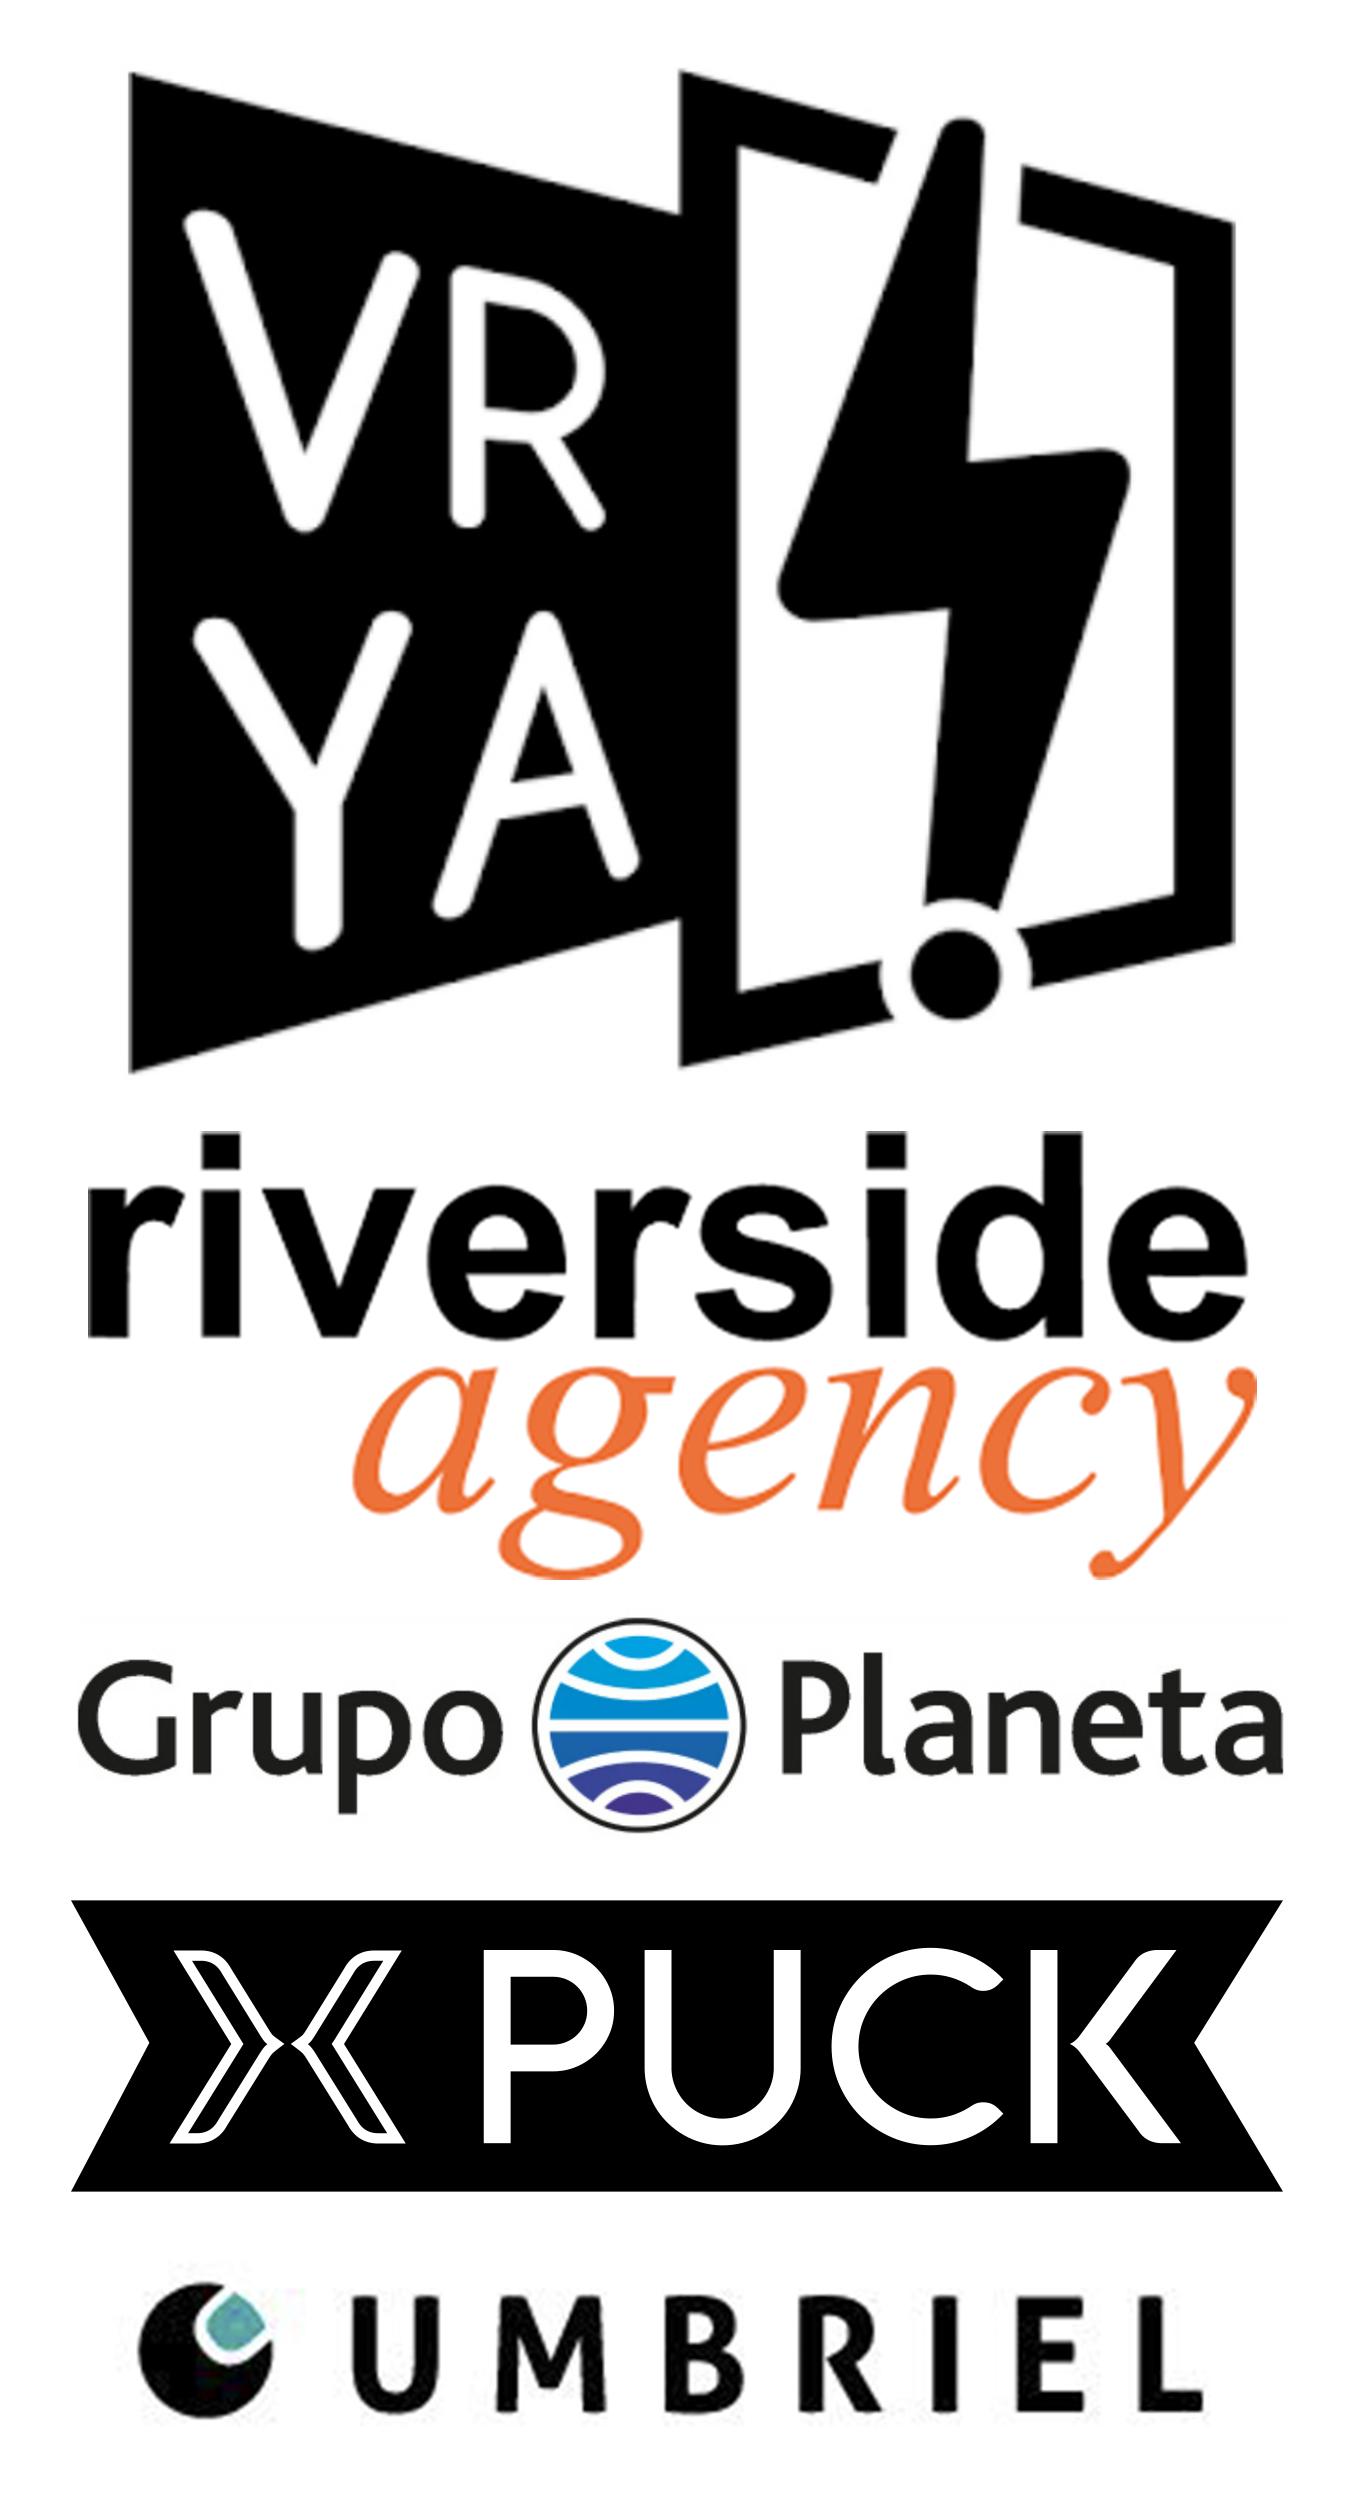 Gracias VRYA, Riverside Agency, Planeta, Puck y Umbriel